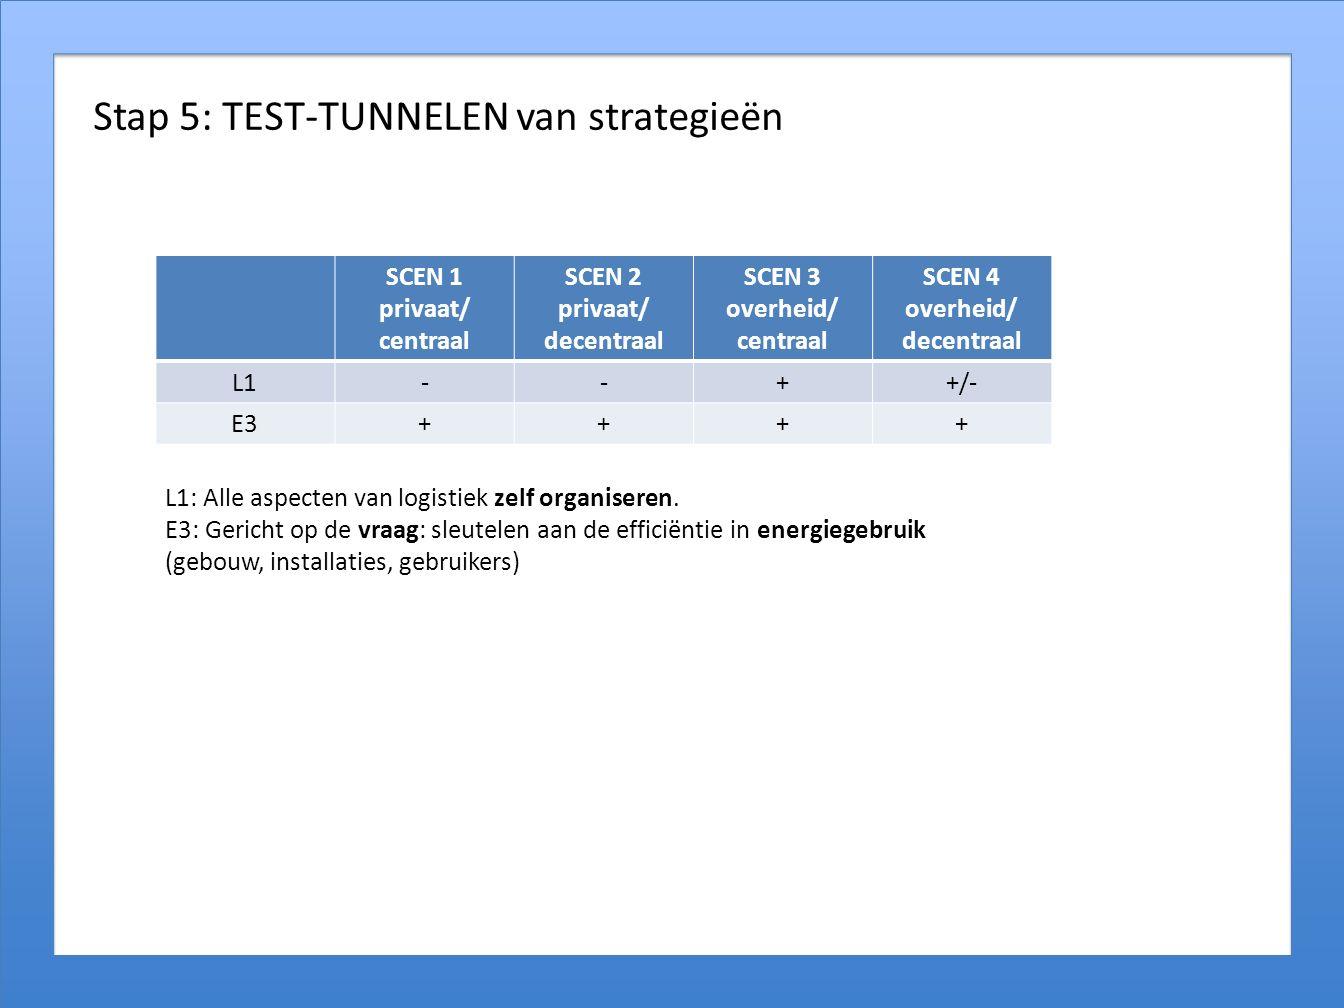 Stap 5: TEST-TUNNELEN van strategieën SCEN 1 privaat/ centraal SCEN 2 privaat/ decentraal SCEN 3 overheid/ centraal SCEN 4 overheid/ decentraal L1--++